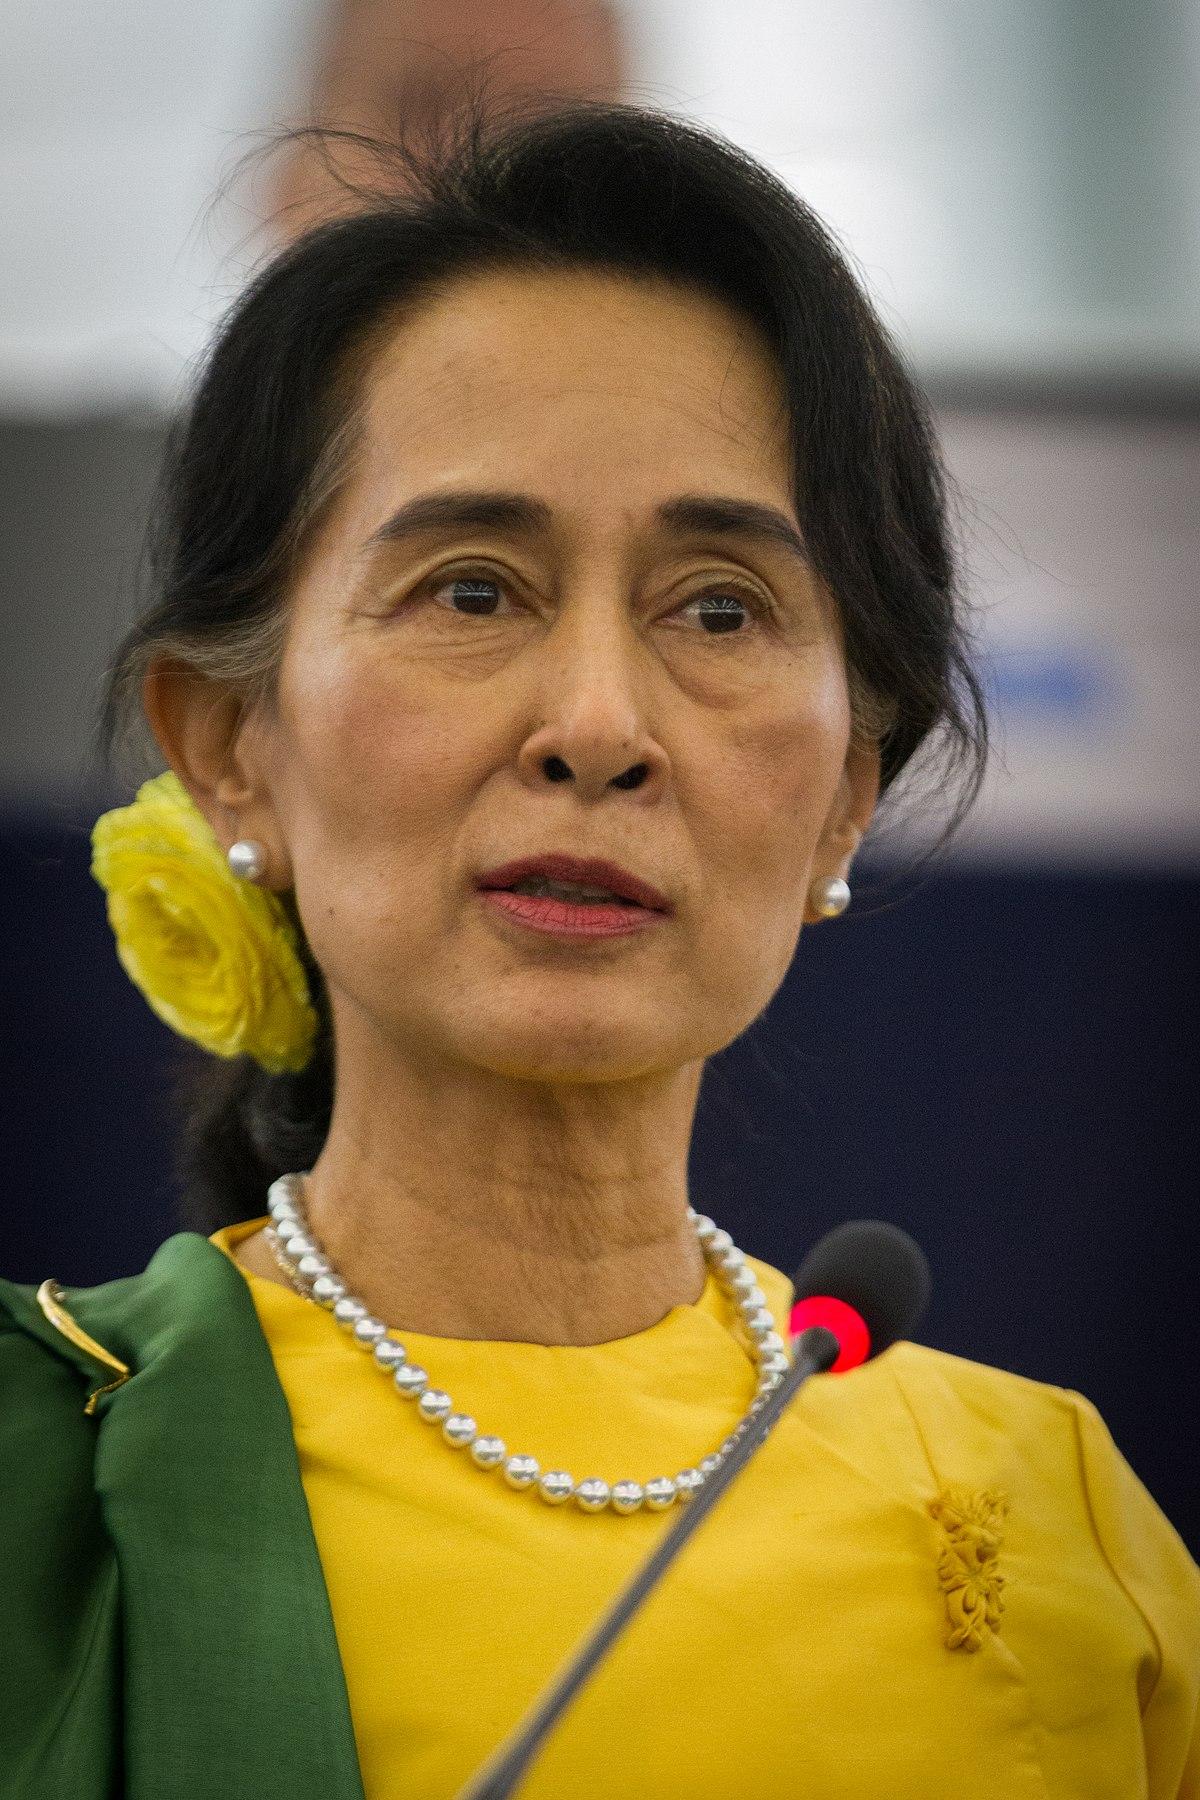 apres-le-coup-detat-en-birmanie-une-pluie-de-condamnations-internationales